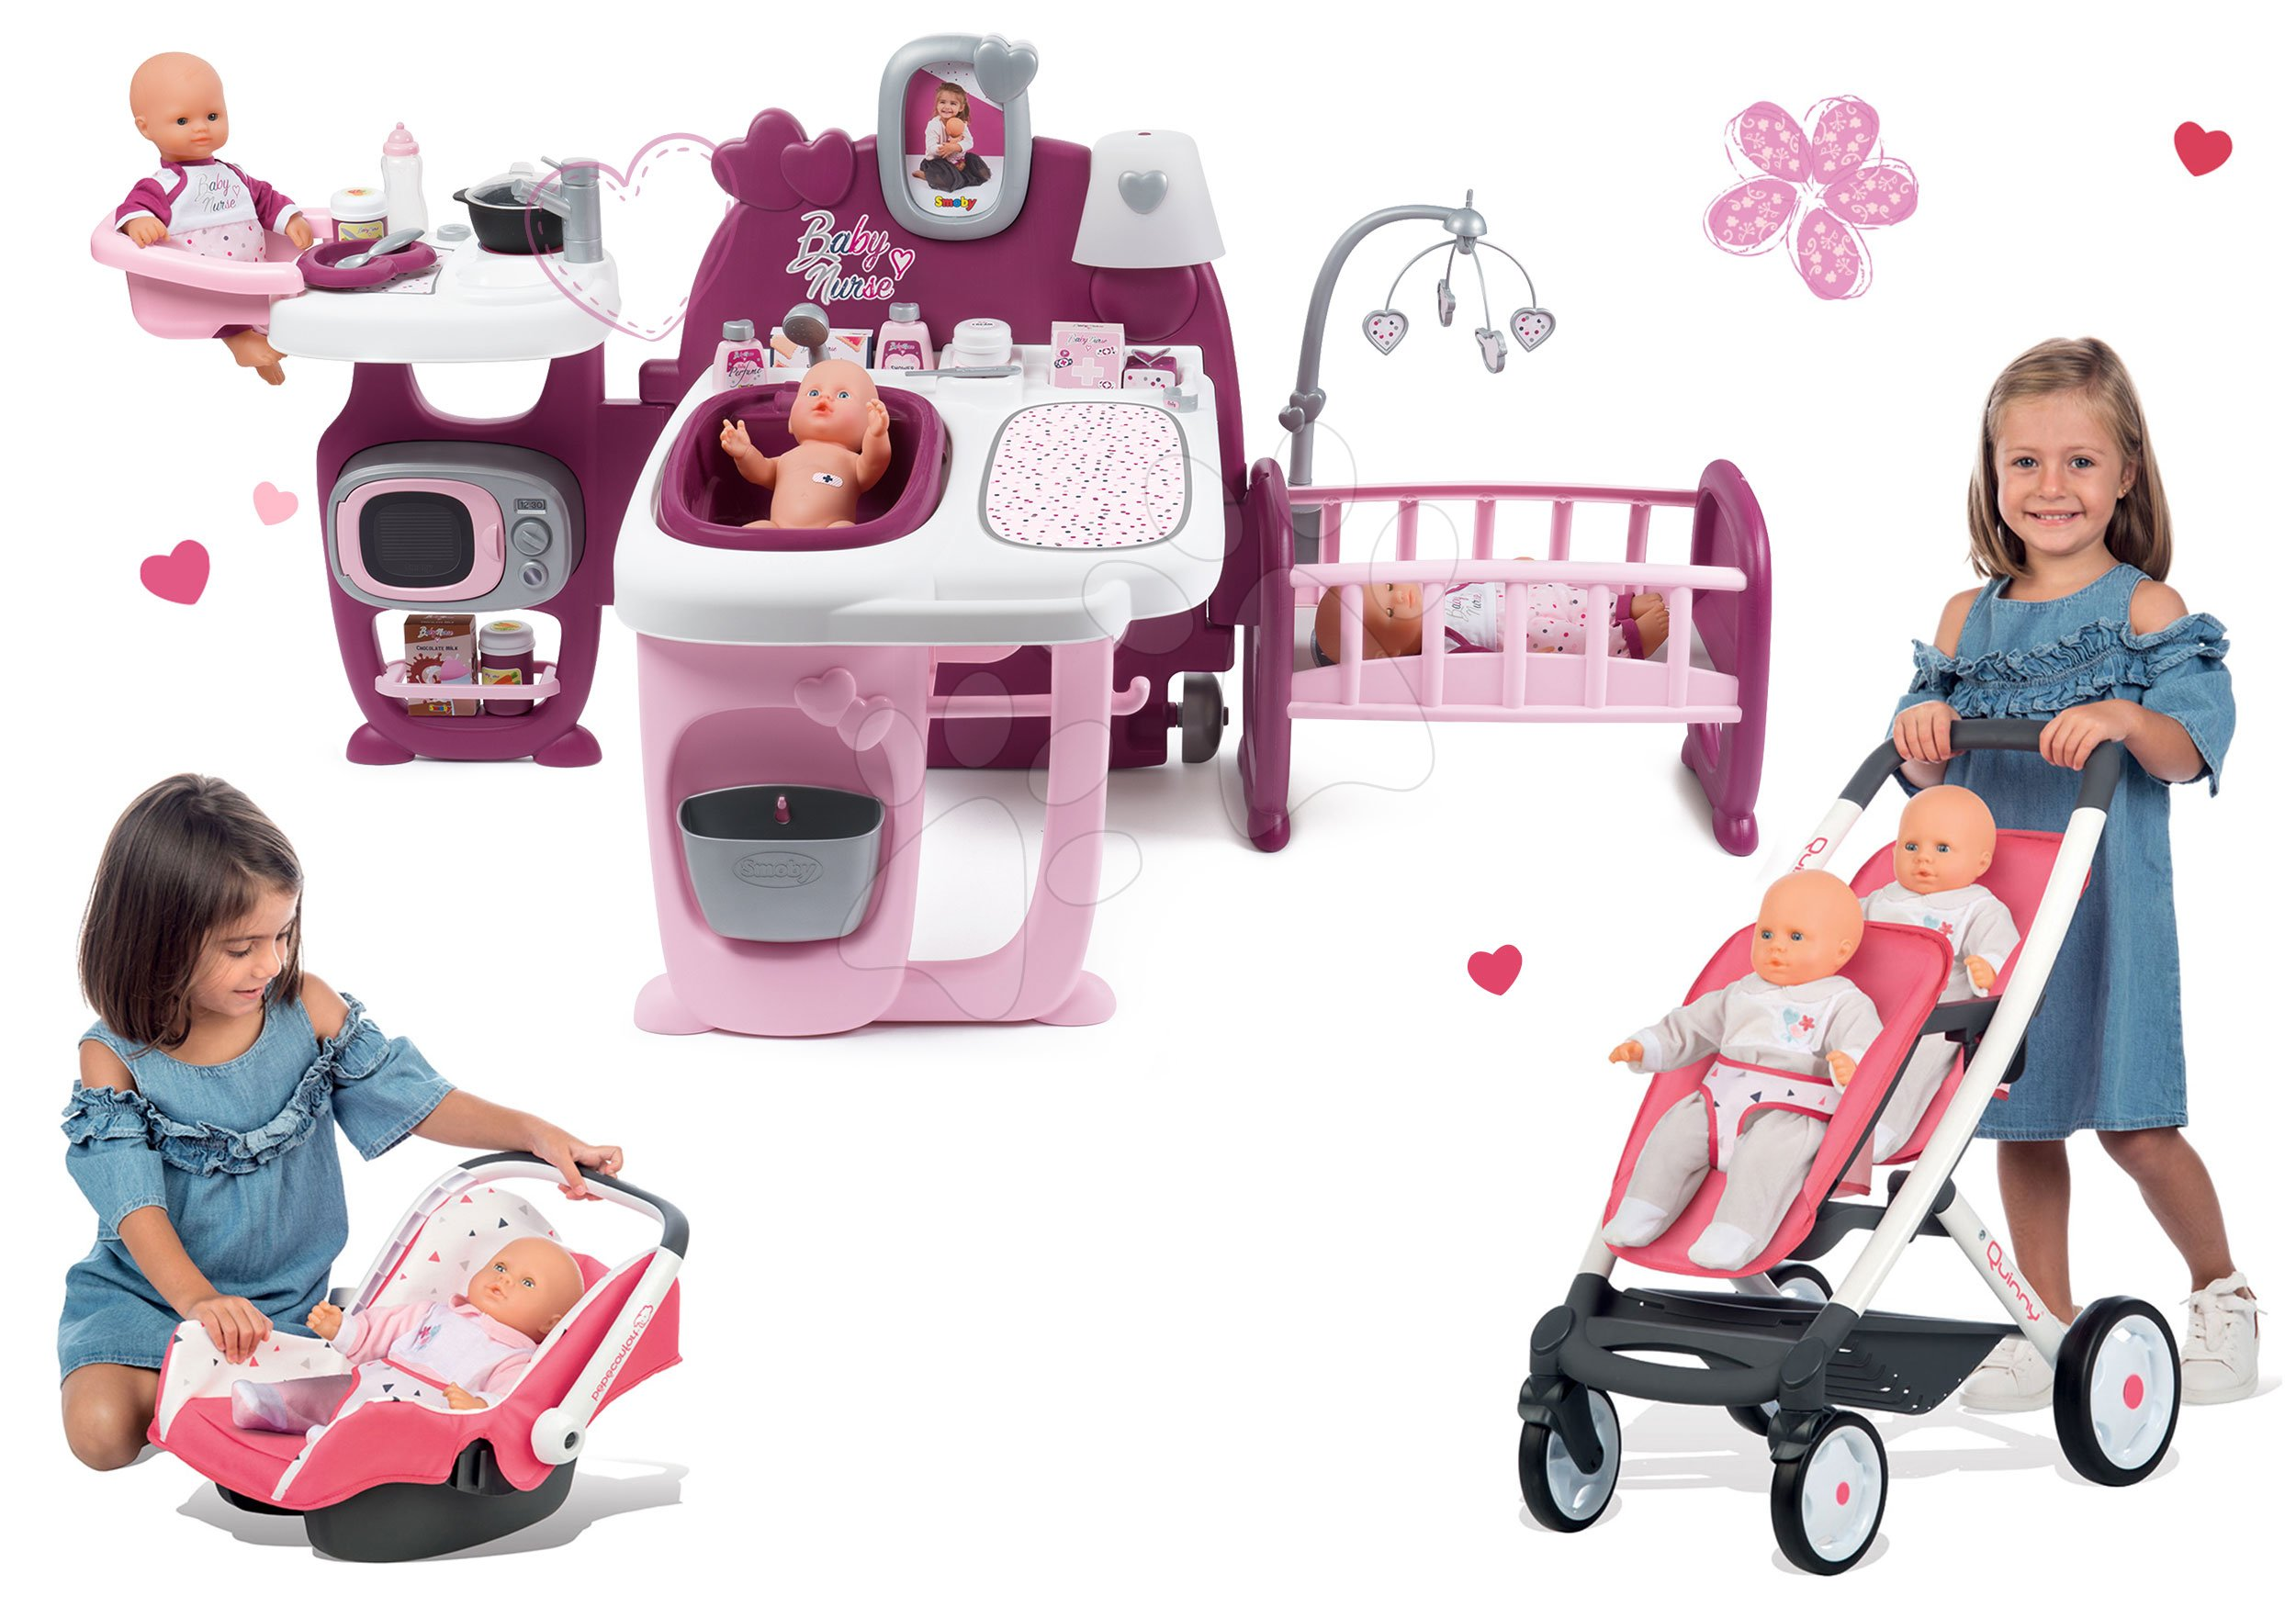 Smoby set domeček pro panenku Baby Nurse Doll´s Play Center a kočárek Trio Pastel s autosedačkou 220327-7